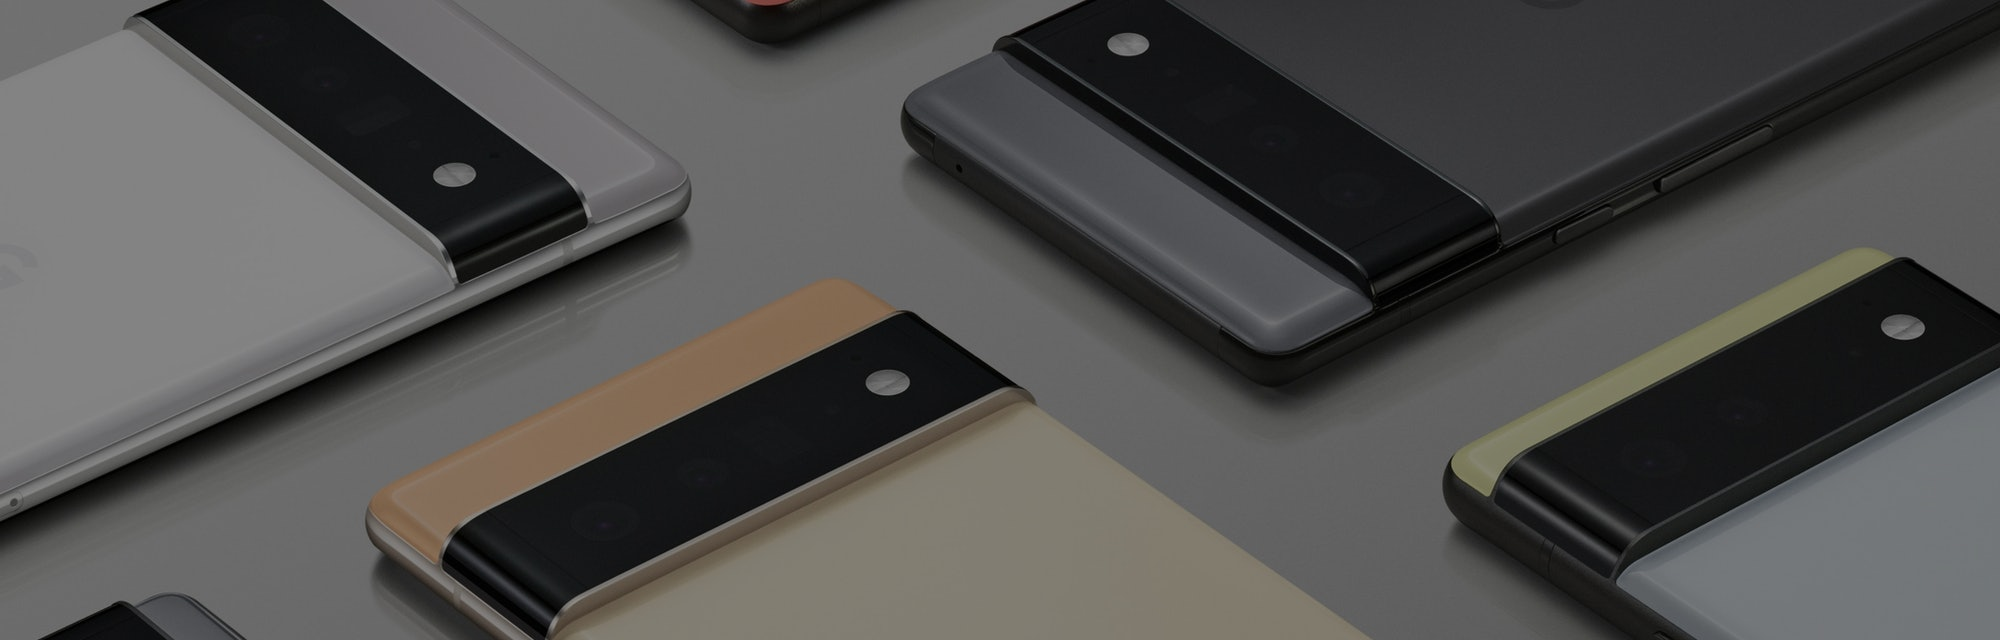 Google recently teased its upcoming Pixel 6 smartphones.